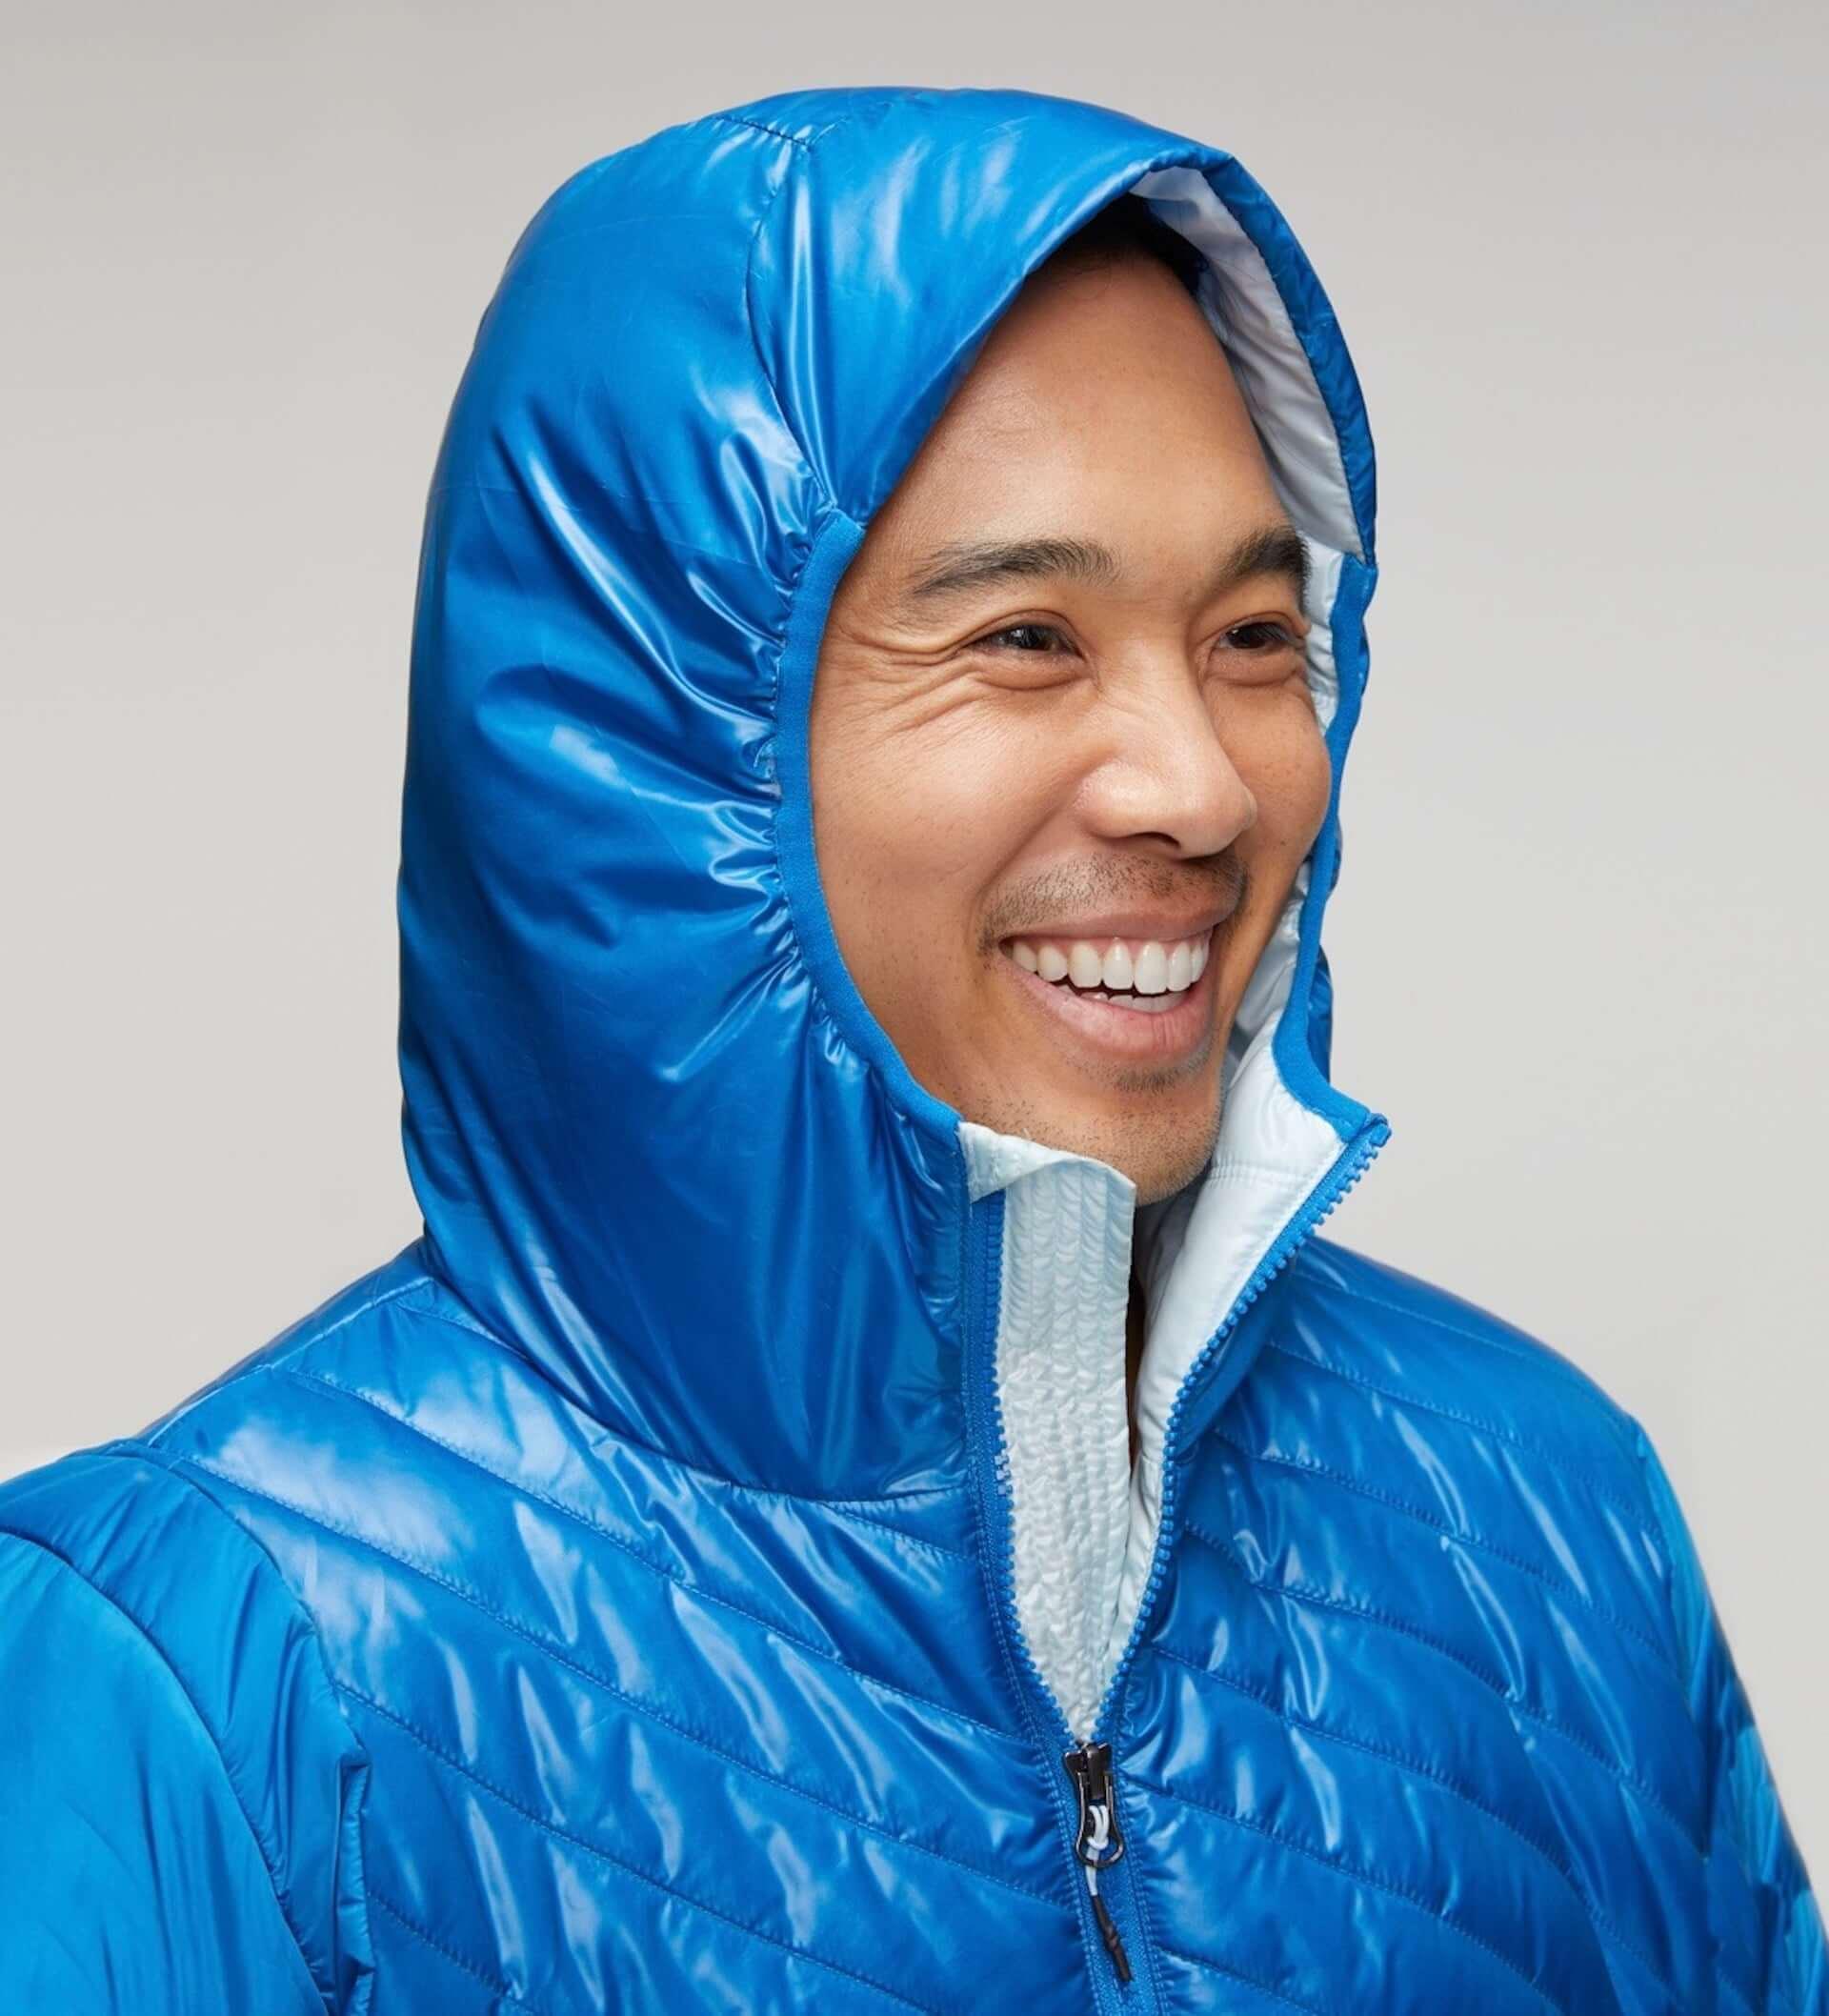 HOKA ONE ONEが秋冬向けの新作パフォーマンスウェアを発表!「GORE-TEX」搭載ジャケットや防寒アクセサリーなど多数展開 lf201113_hokaoneone_16-1920x2116